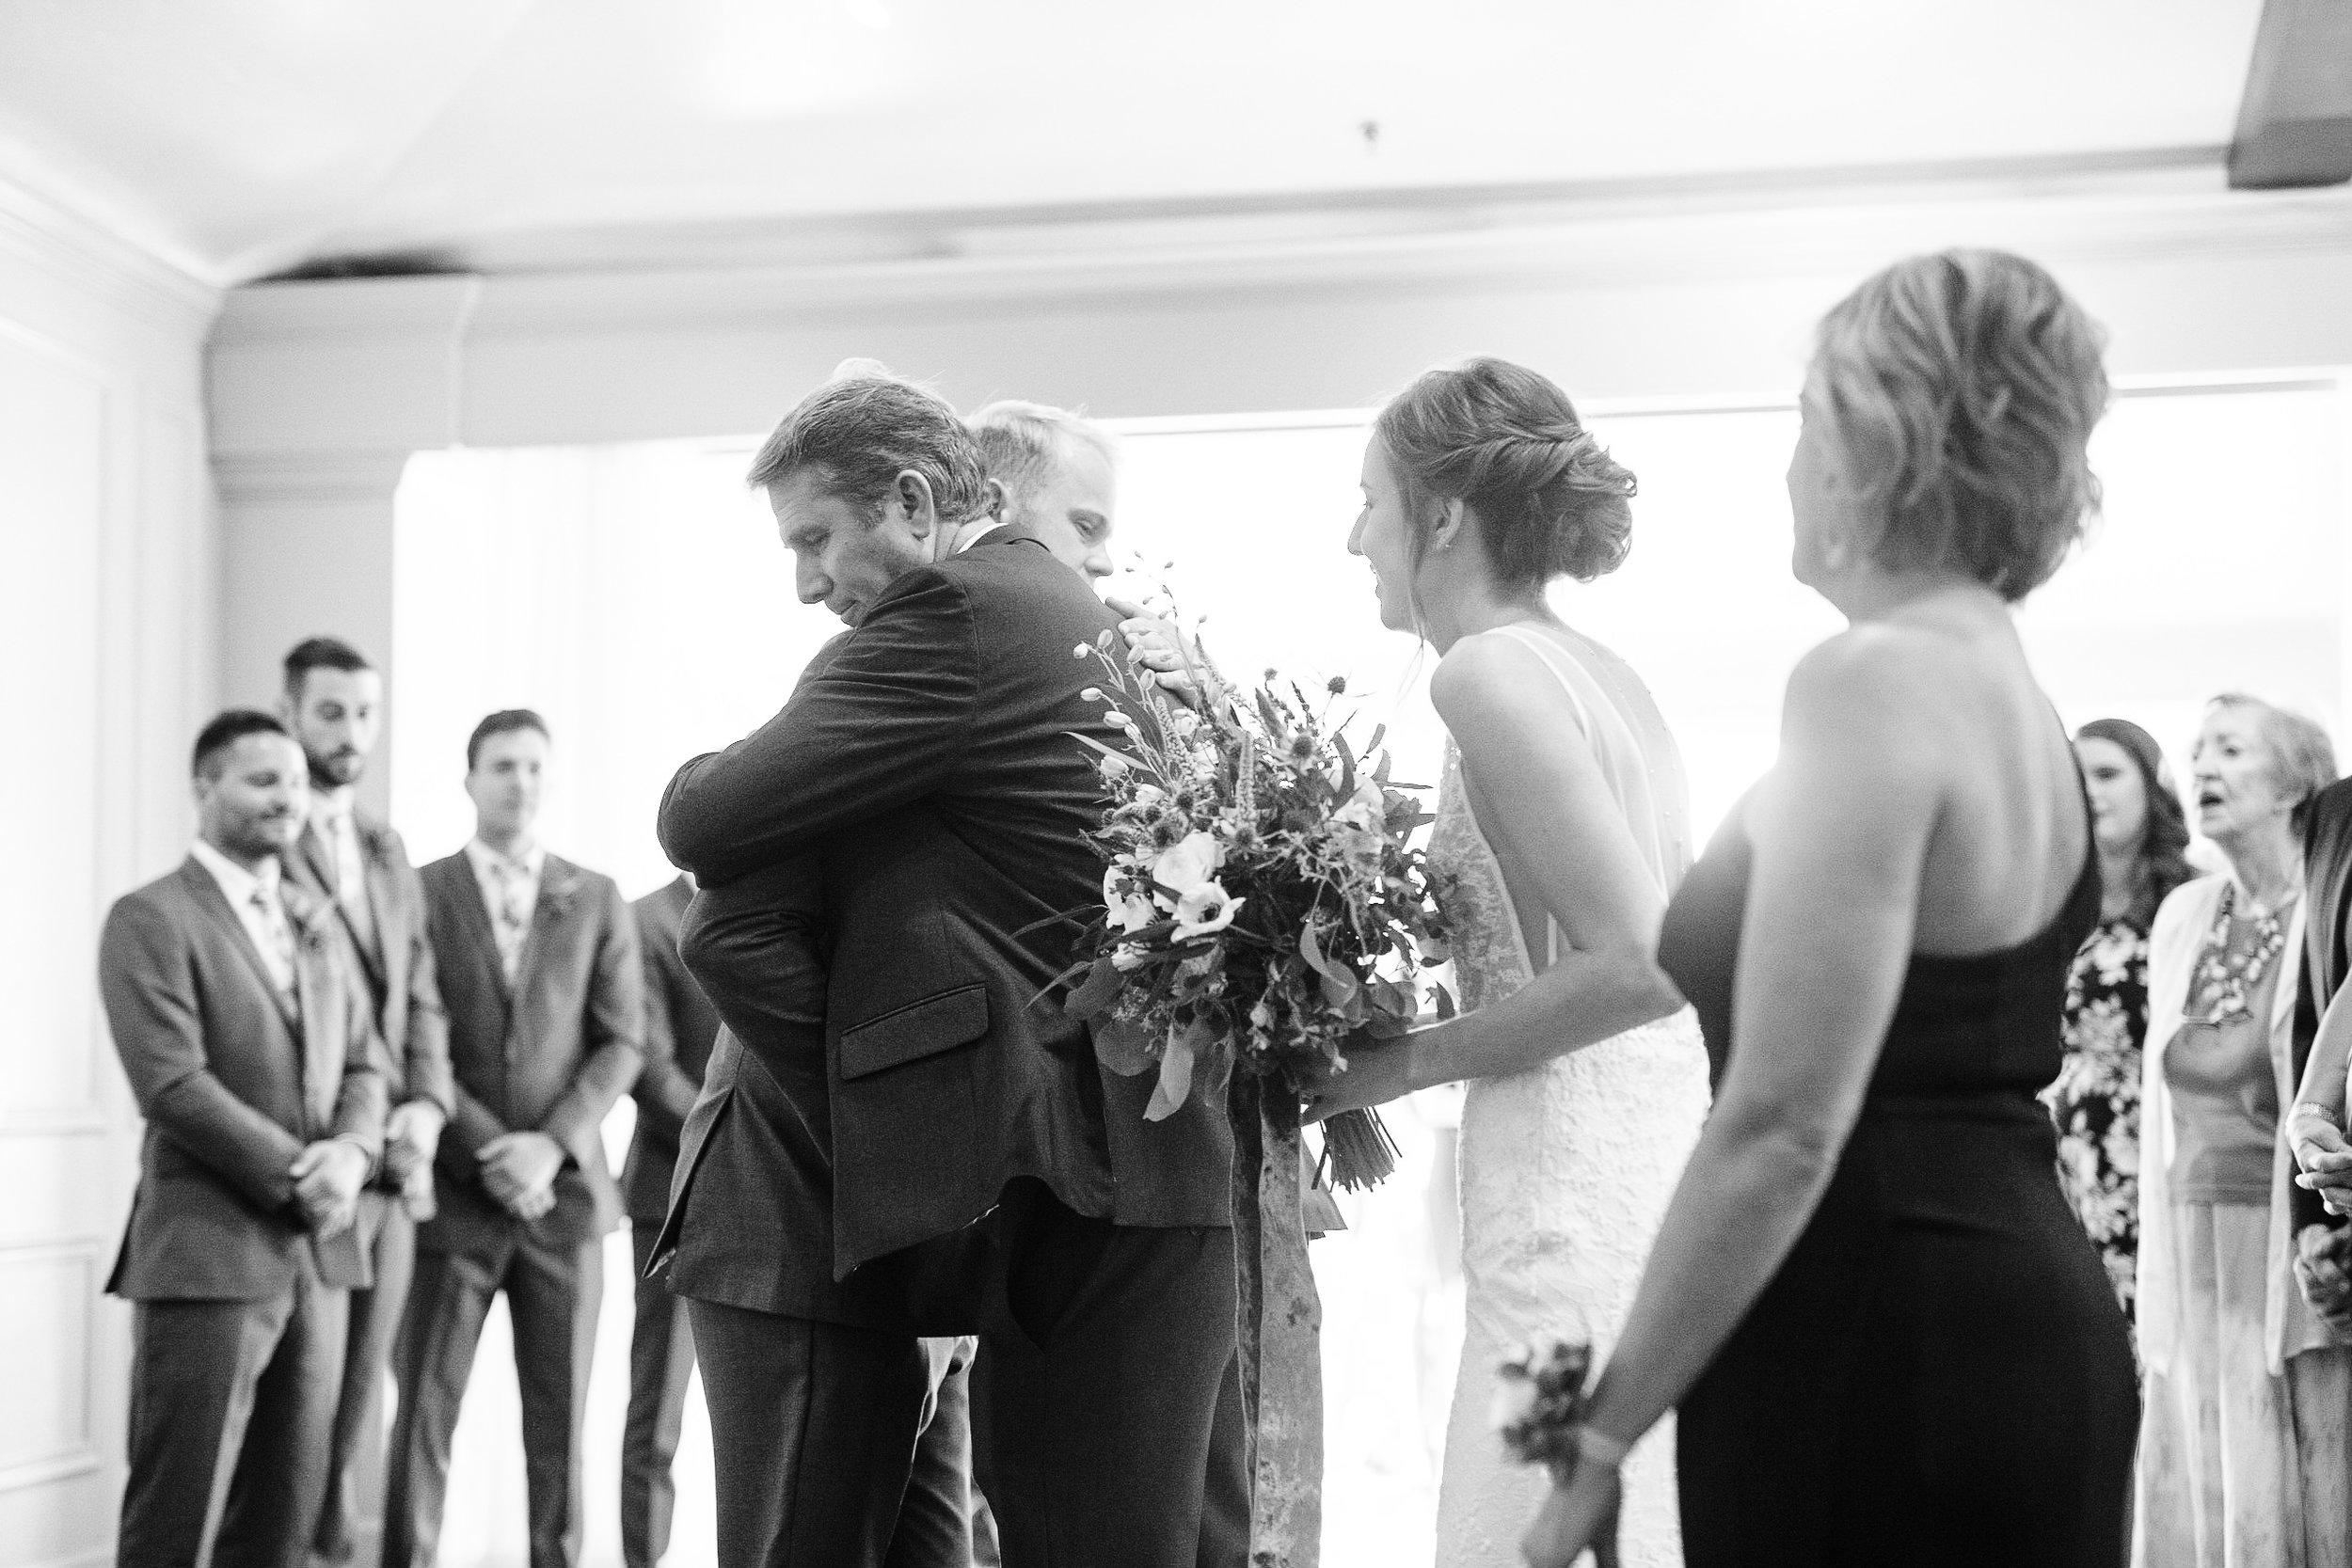 okc-wedding-photographer-coles-garden-wedding-okc-best-wedding-photographers-115.jpg